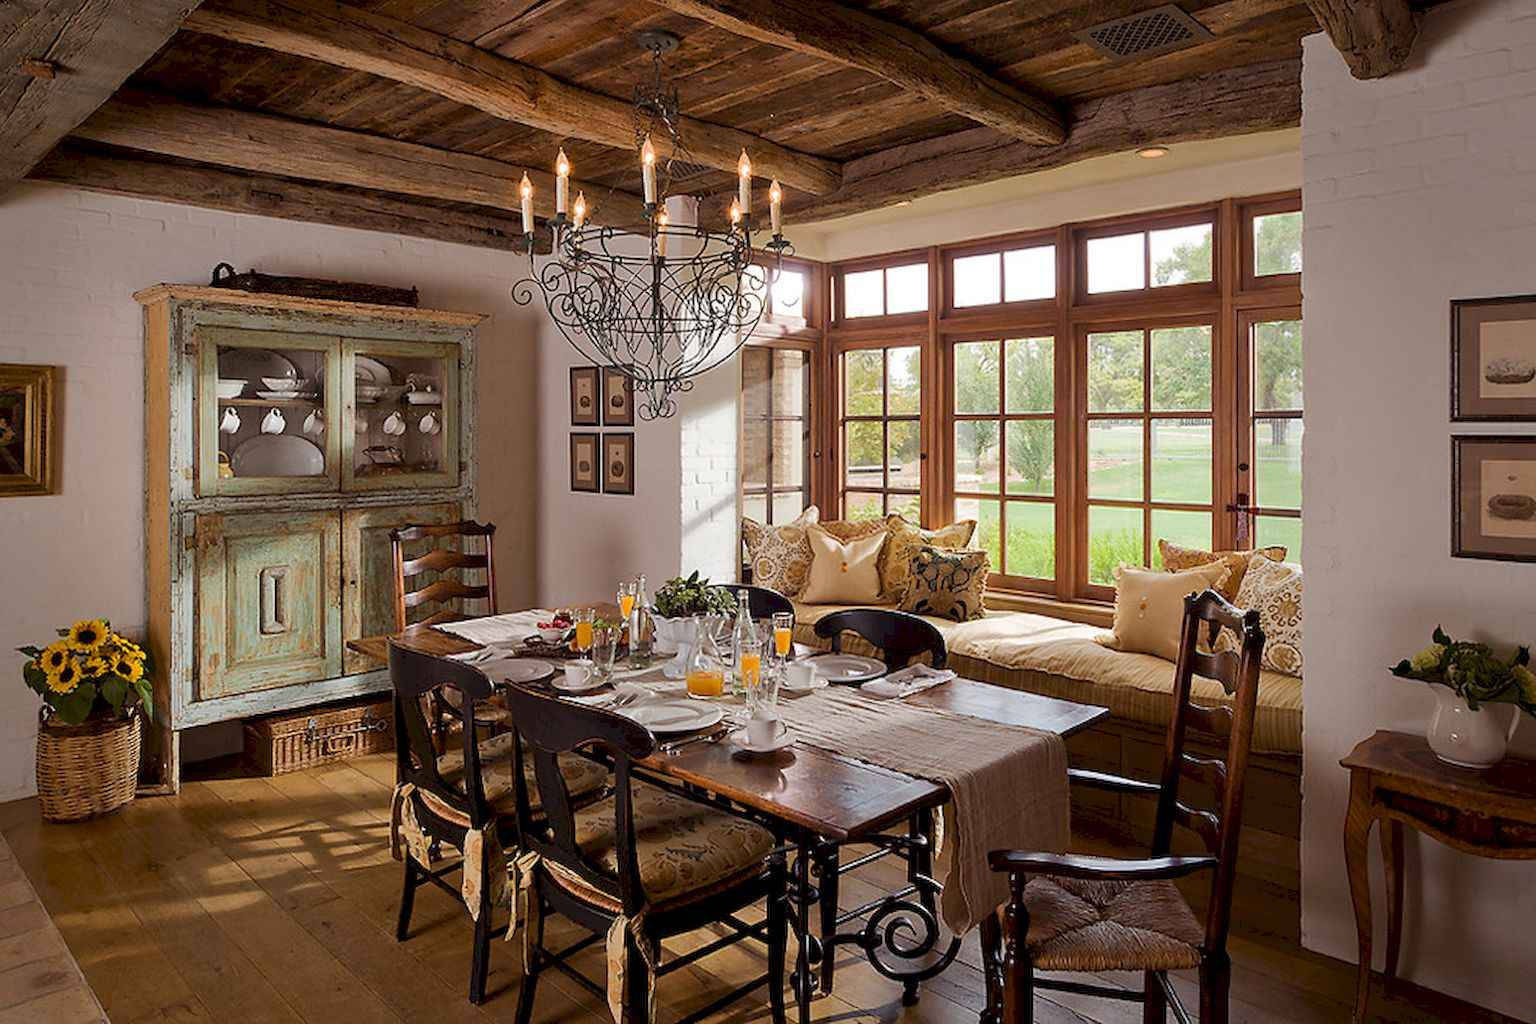 100 Rustic Farmhouse Dining Room Decor Ideas (93)